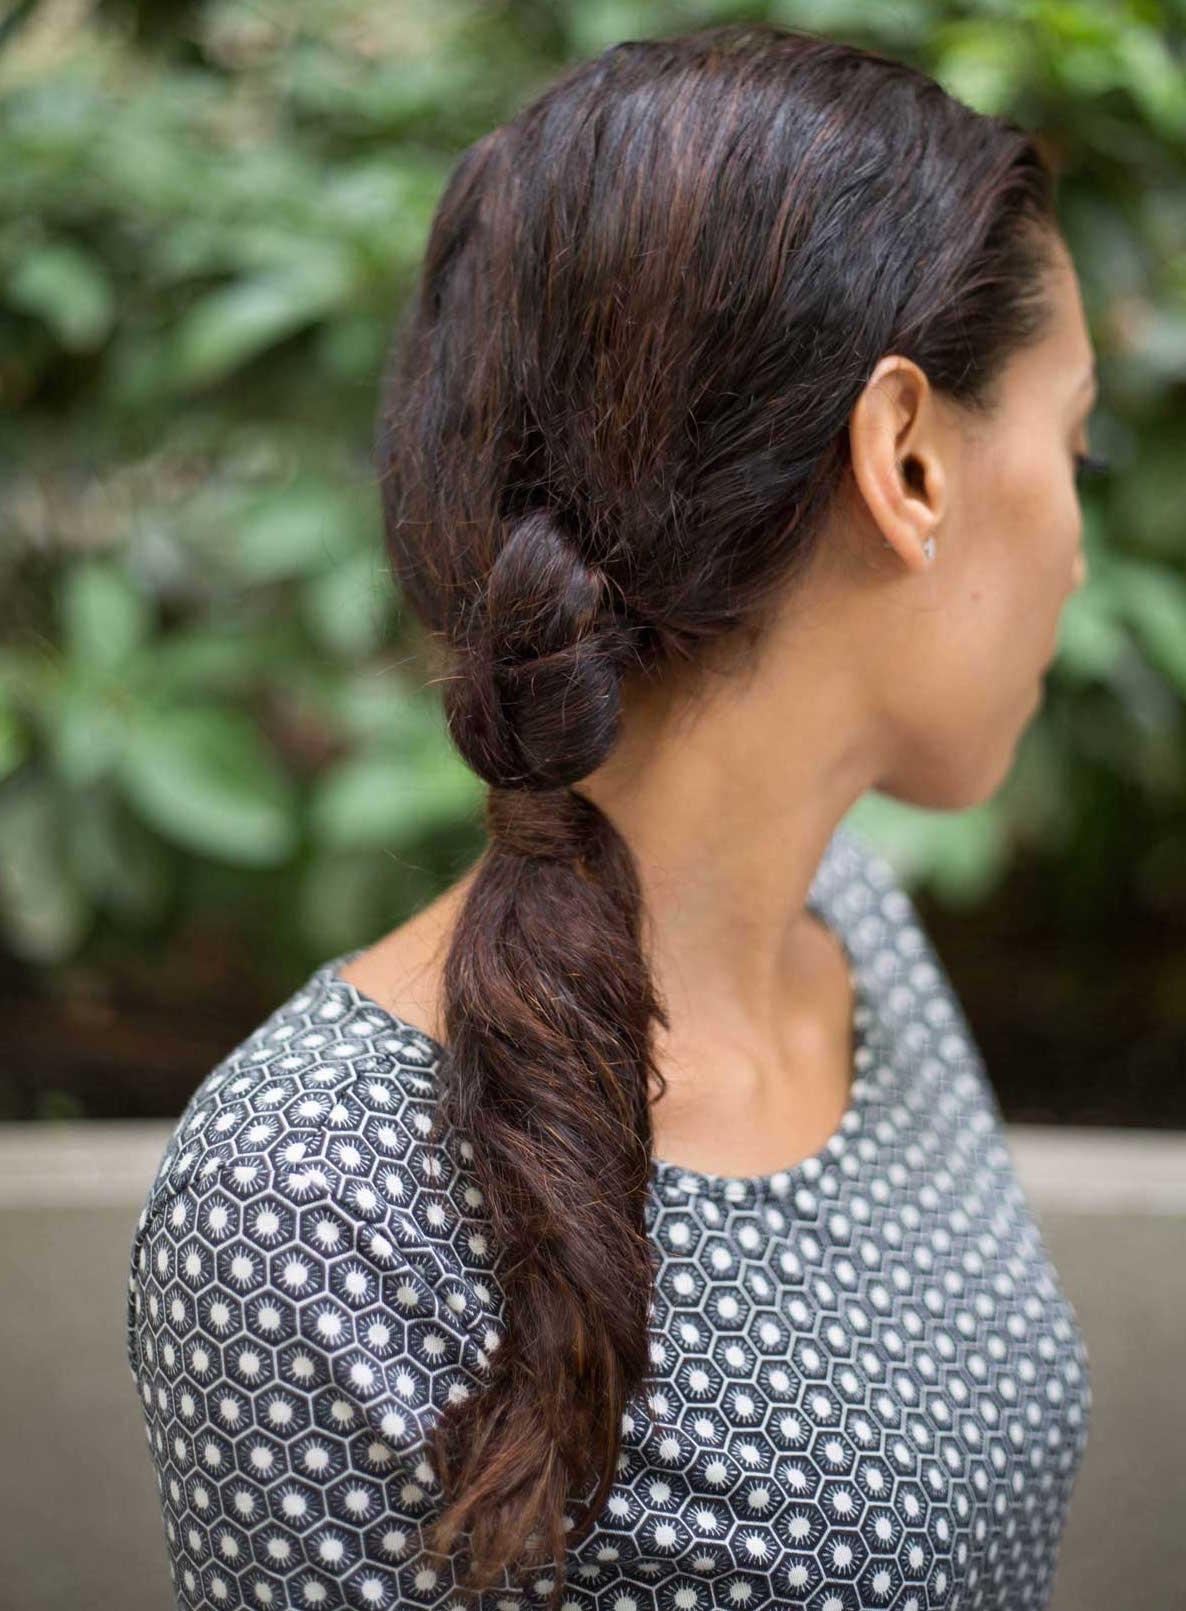 bestie-braid hair 7